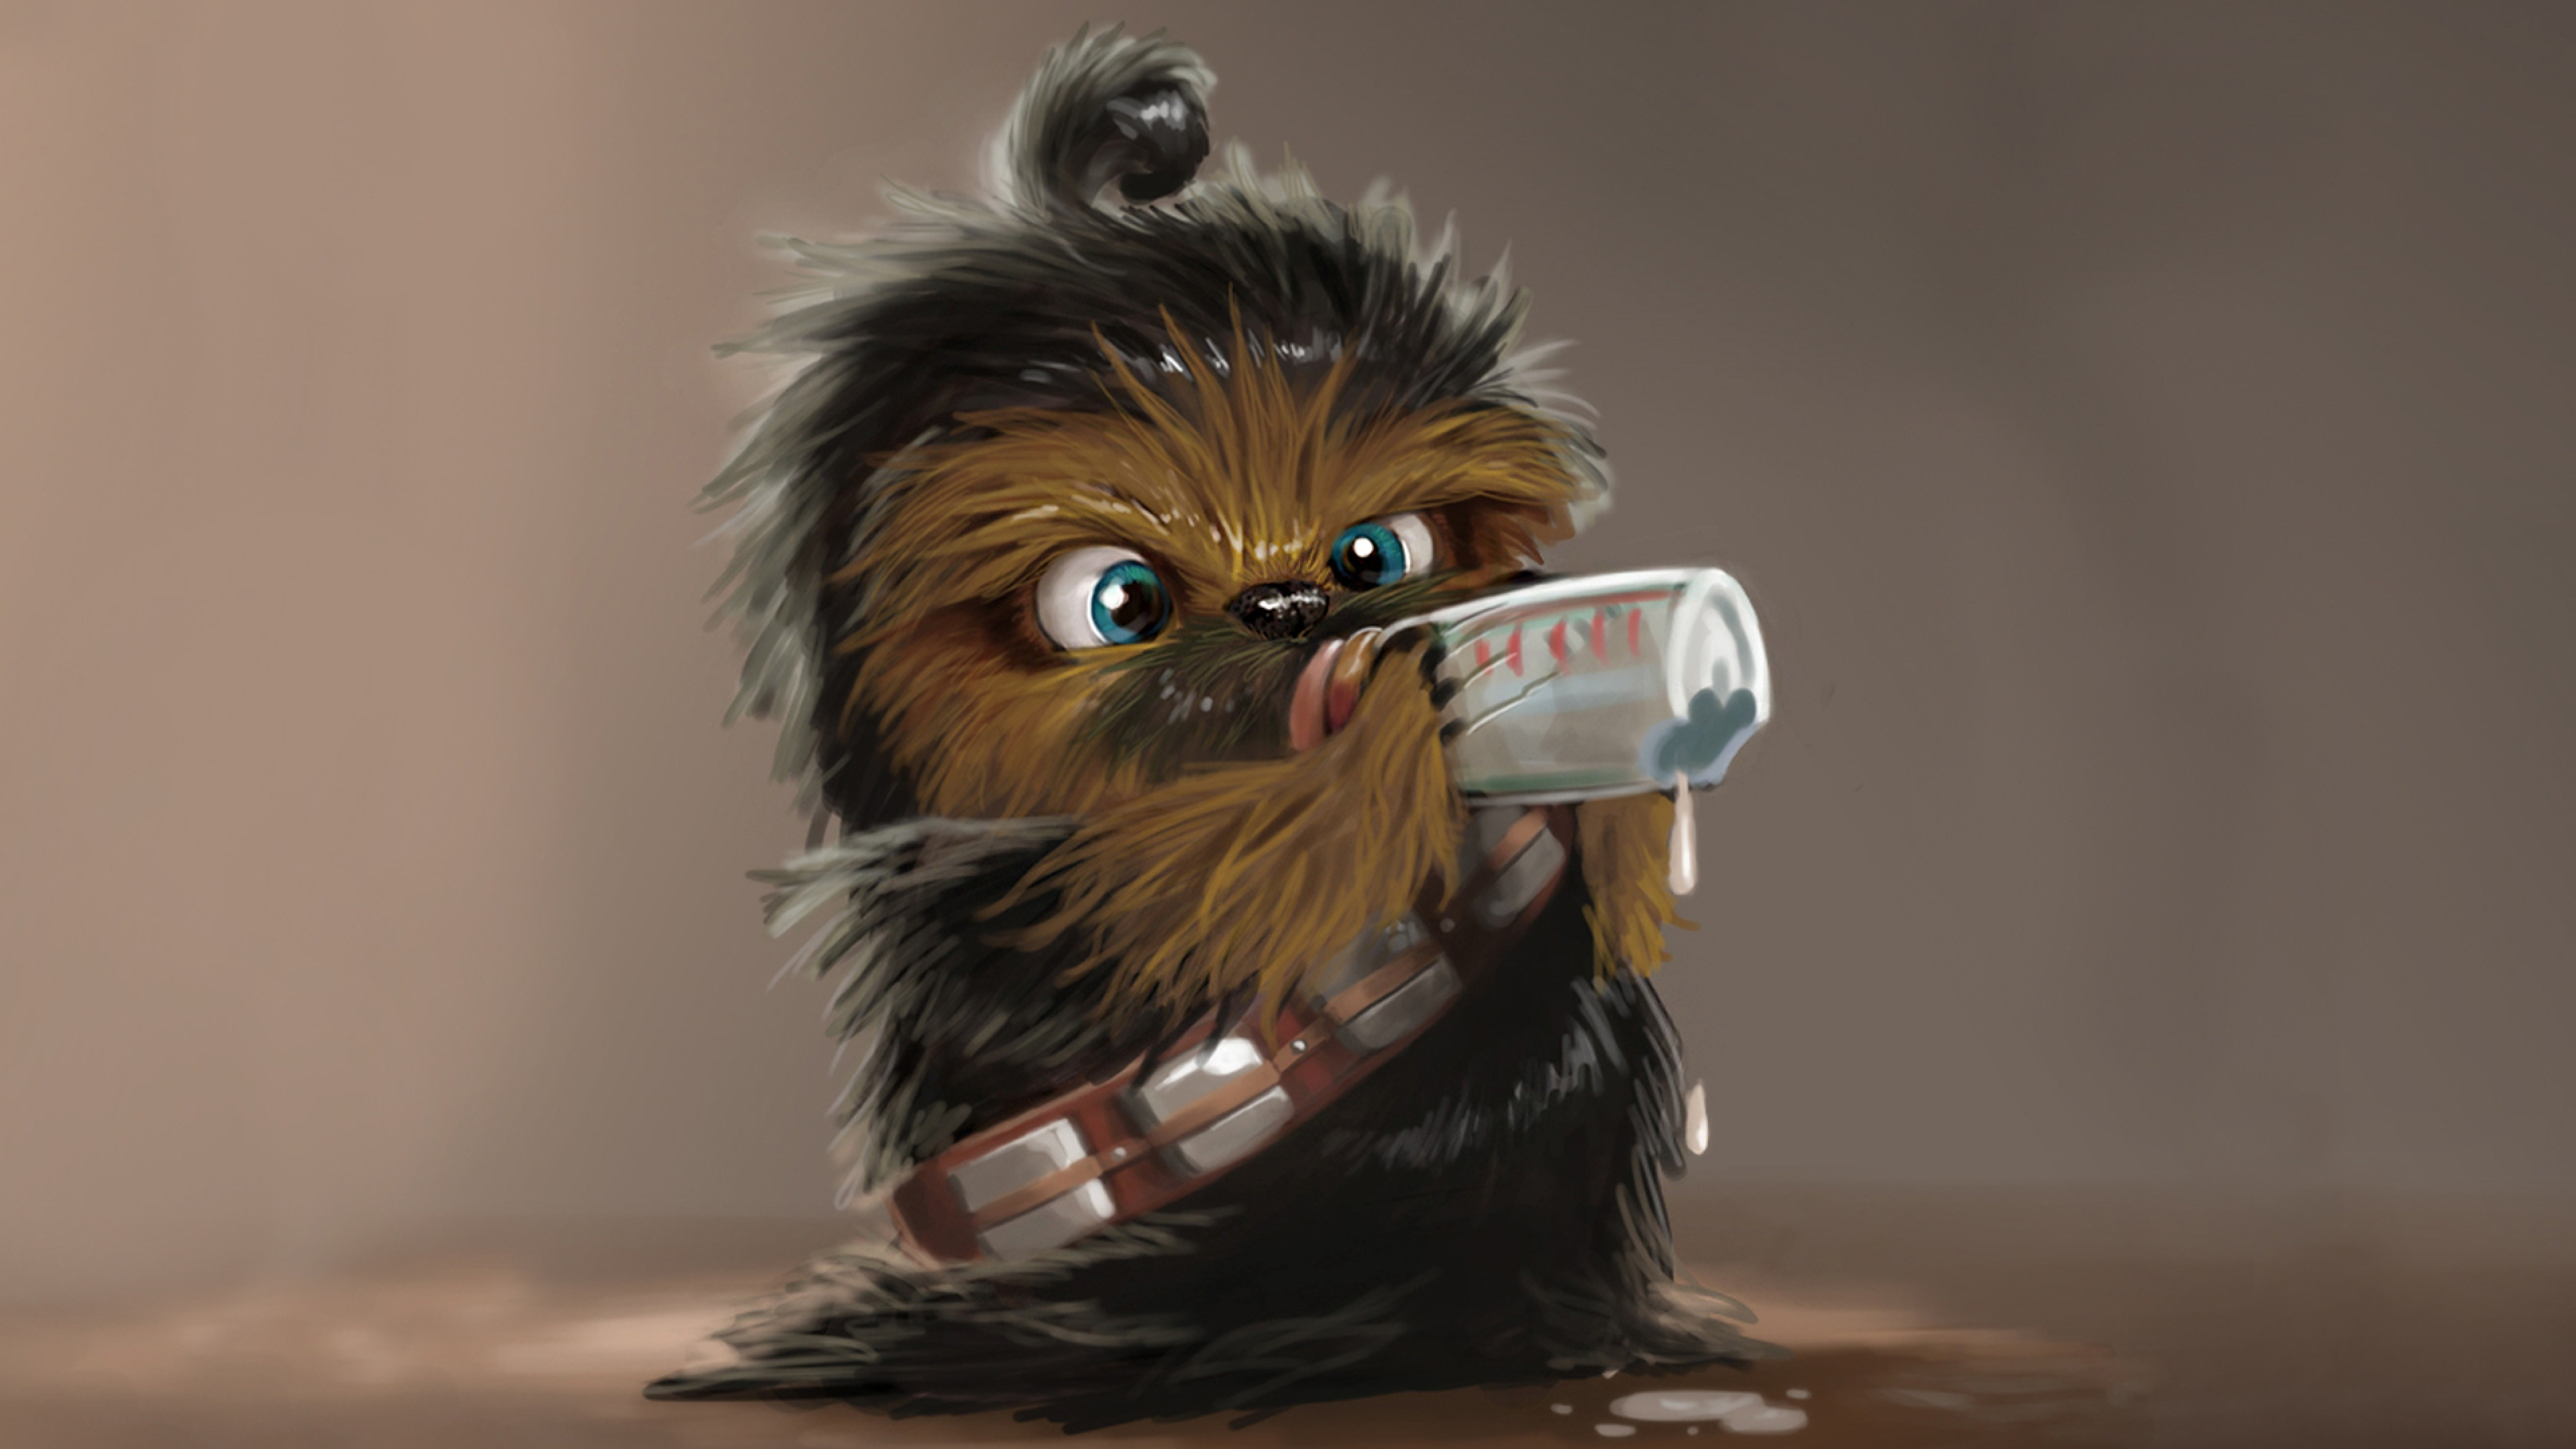 star wars chewbacca drink baby 3840x2160